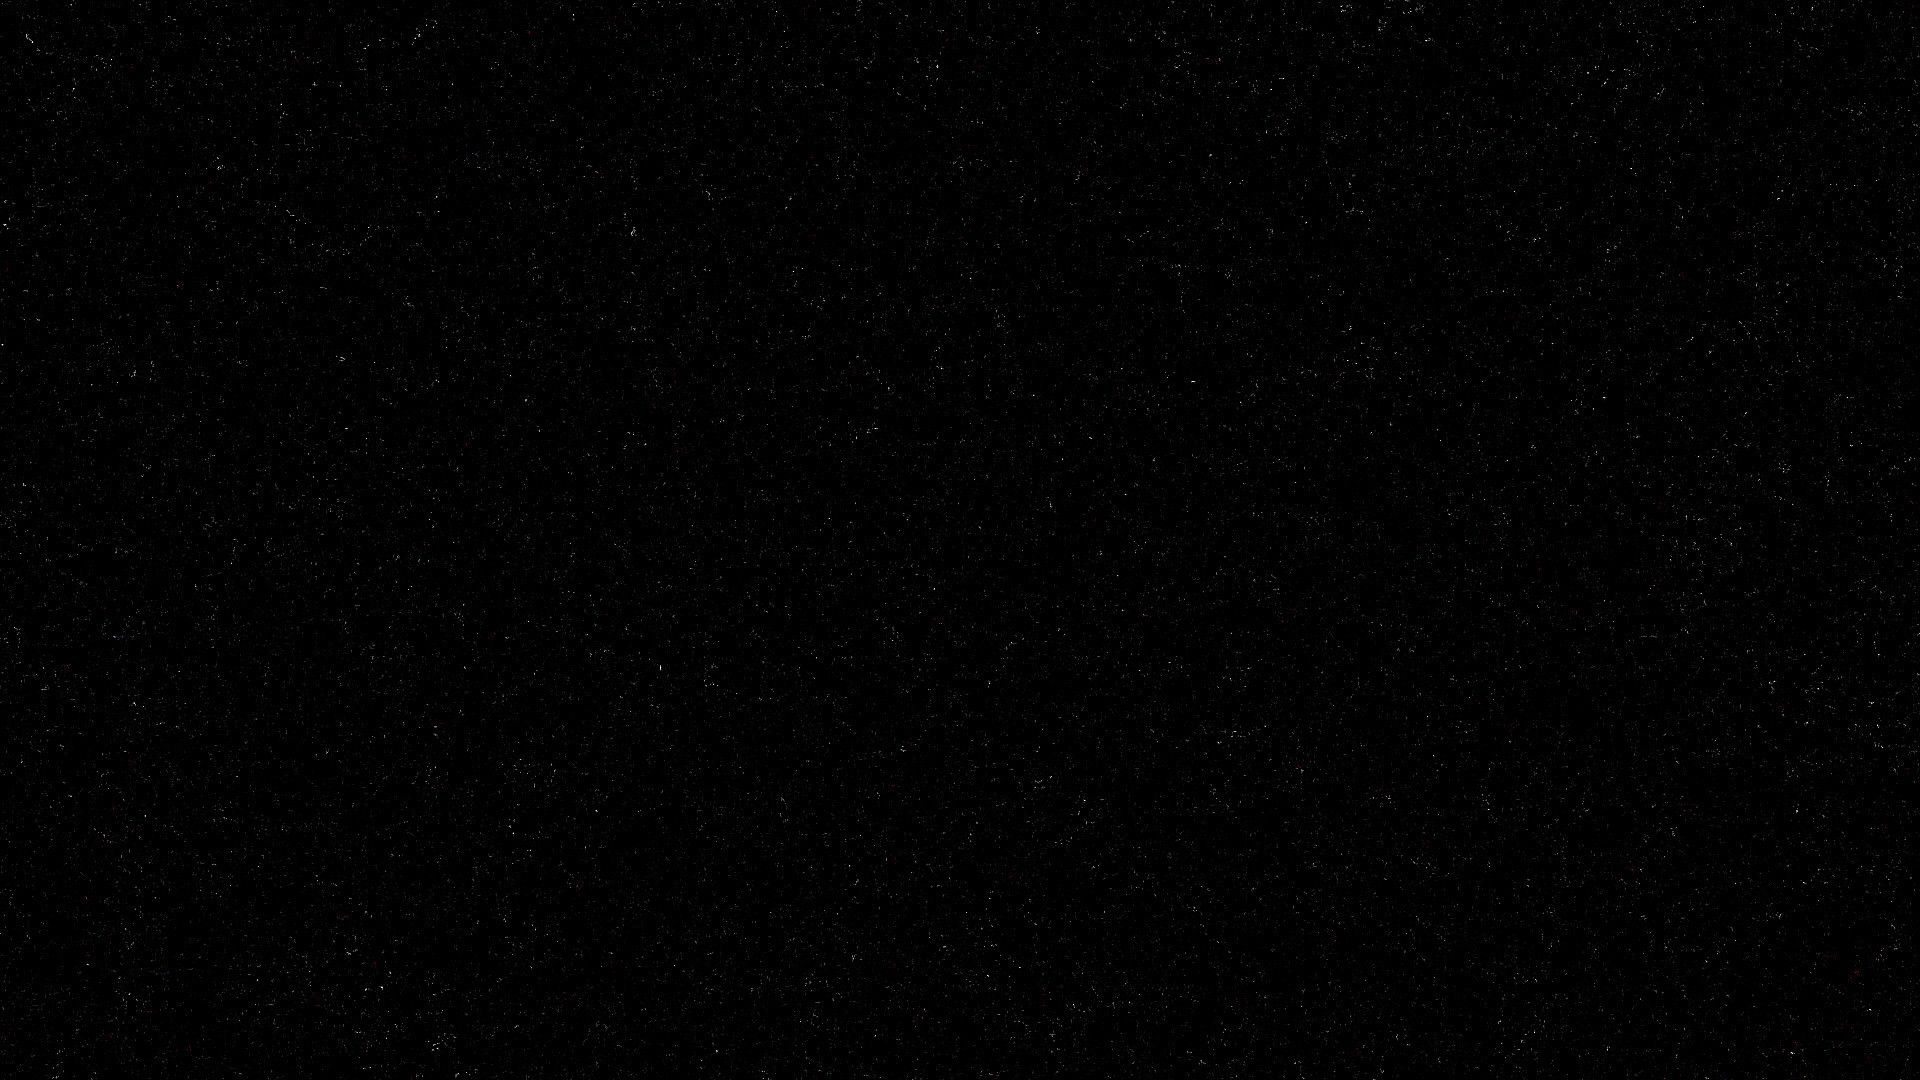 Black Screen 4k Wallpapers Top Free Black Screen 4k Backgrounds Wallpaperaccess